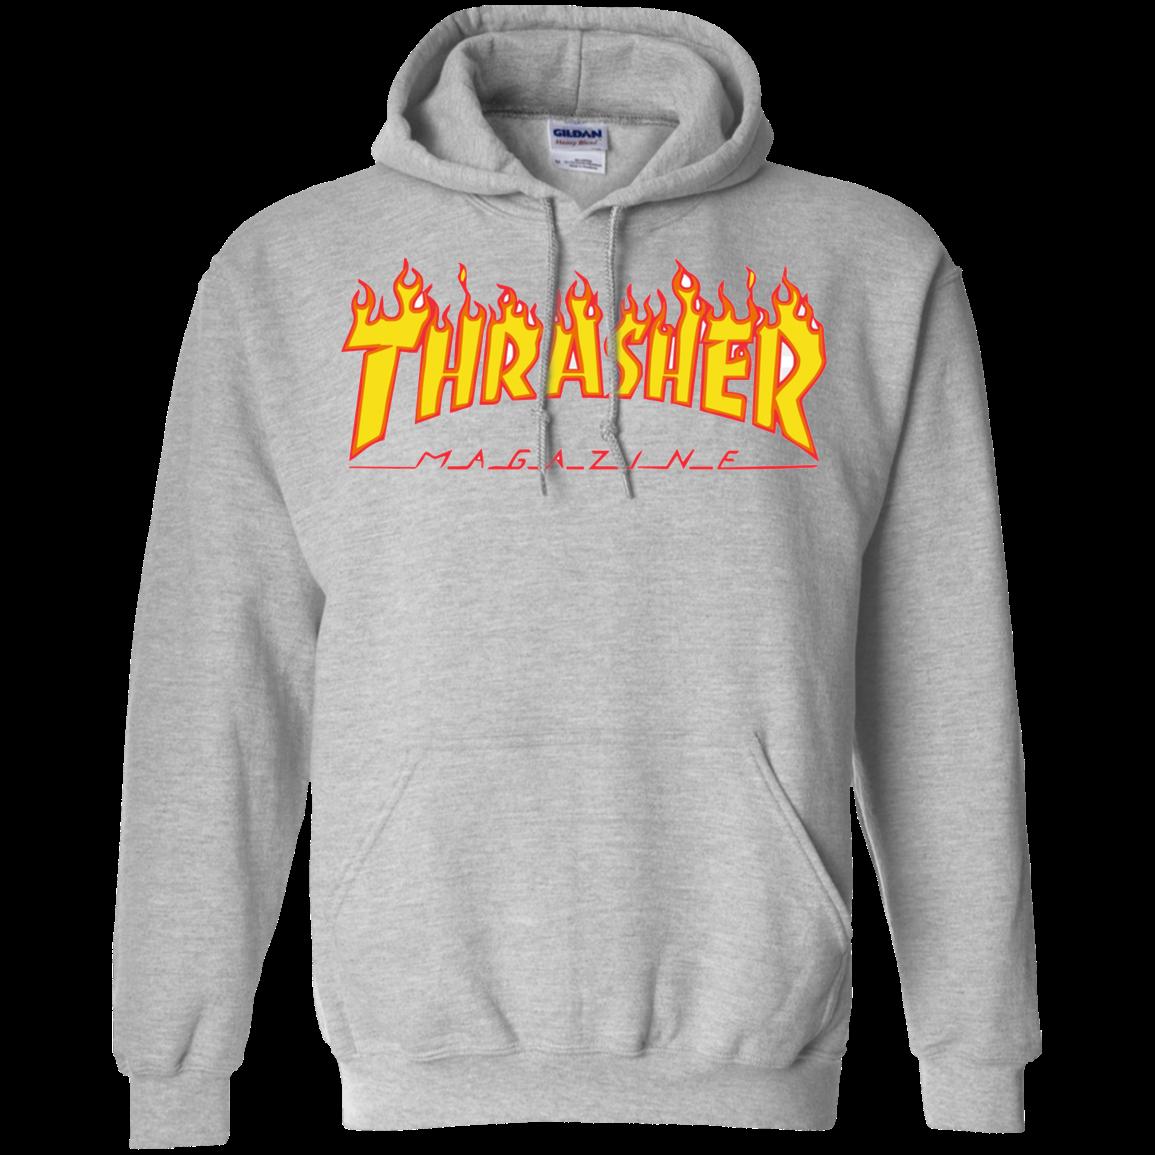 Thrasher Magazine Shirt G185 Pullover 8 Oz